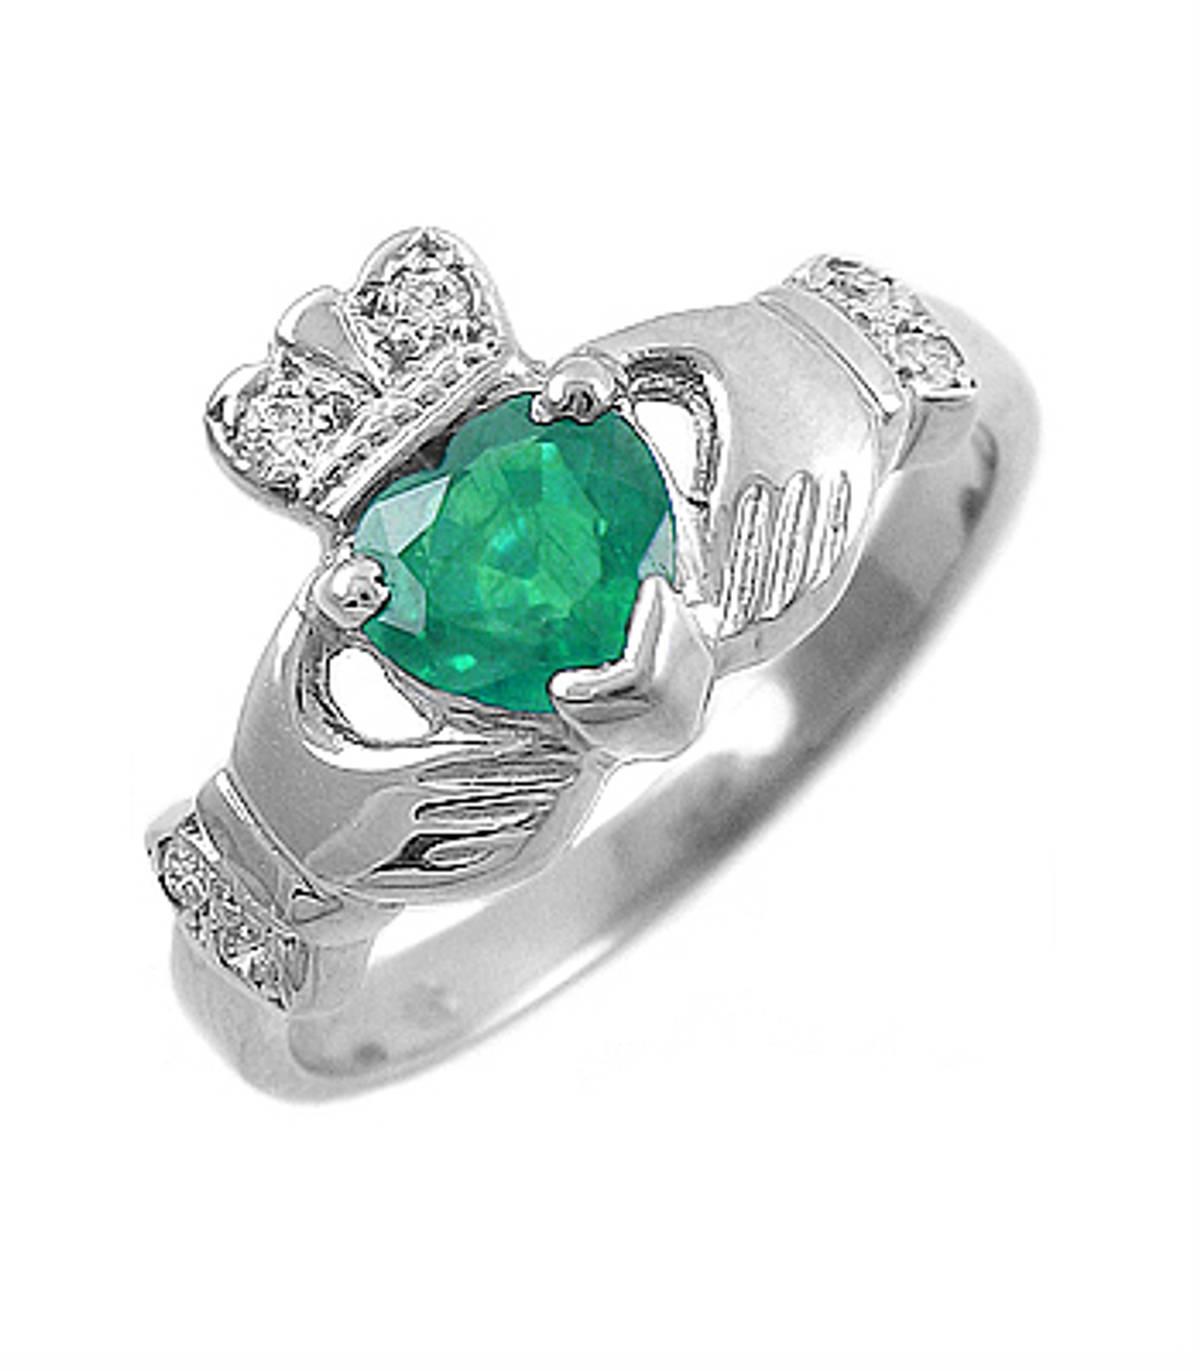 BeautifulIrish madeCL400A-22 14 carat white gold 0.55cts emerald/0.06cts diamonds Claddagh Engagement ring